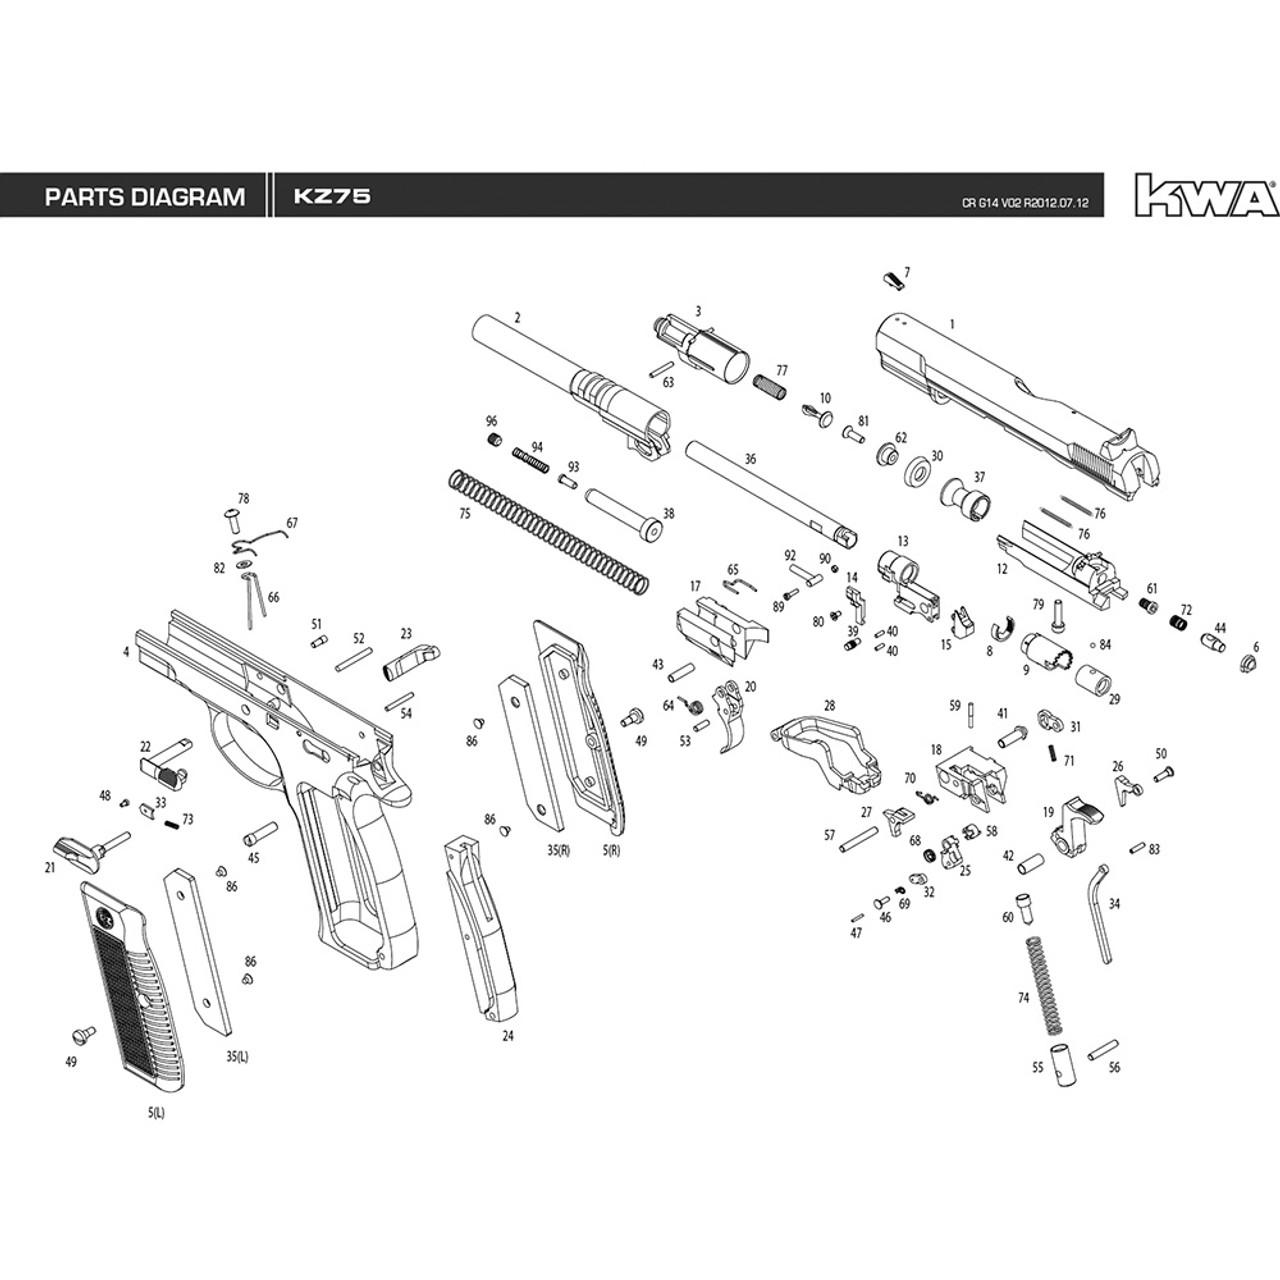 hight resolution of kwa airsoft kz75 pistol diagram